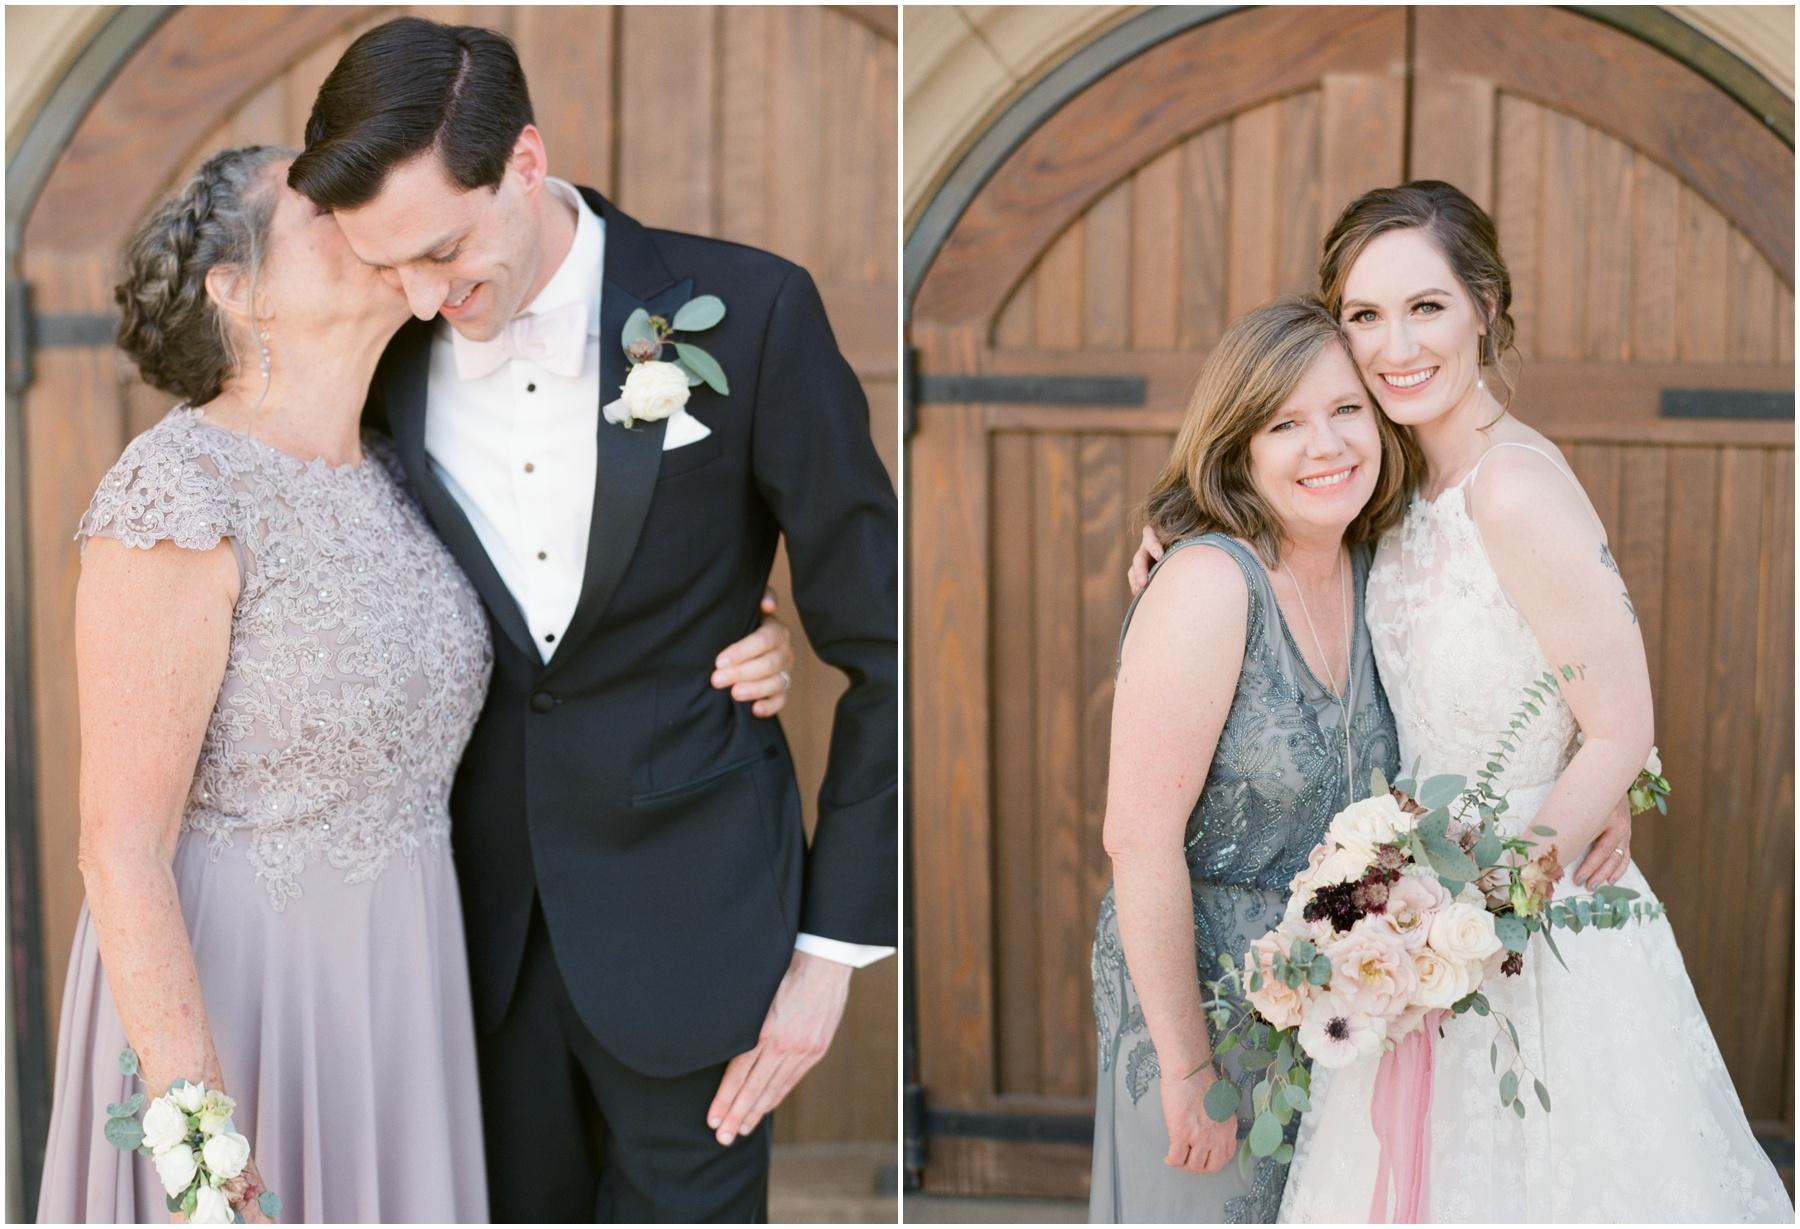 Scribner-bend-vineyards-wedding-sacramento-california-Kristine-Herman-Photography-85.jpg